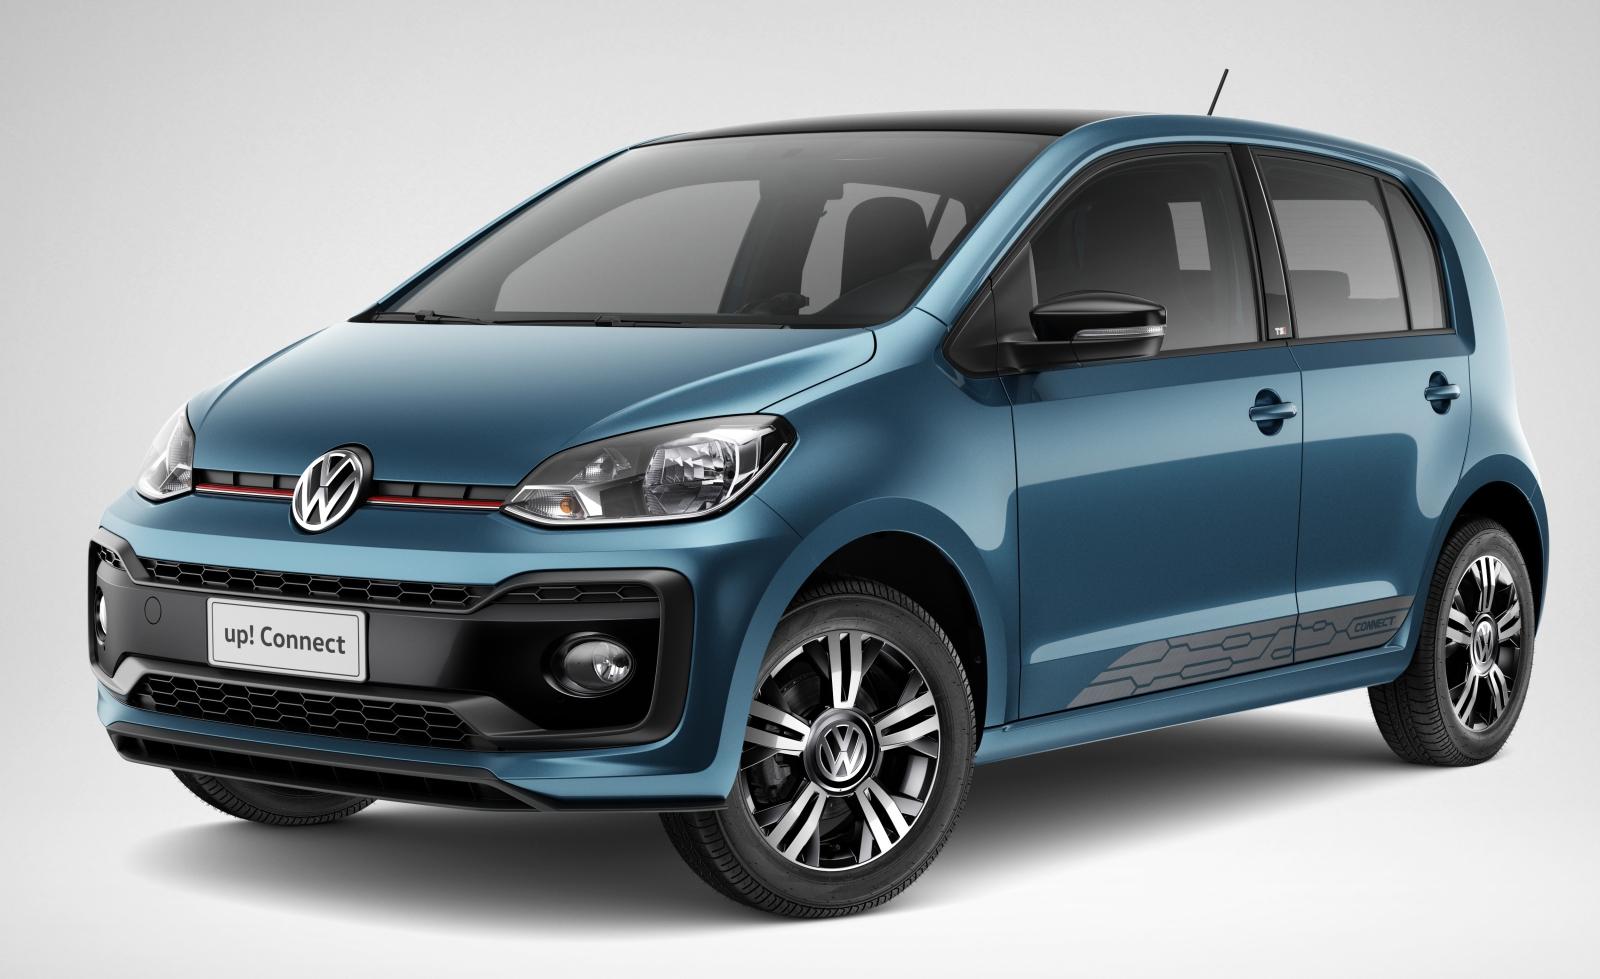 Volkswagen up! 2018: o compacto mais inteligente ganha conectividade e design esportivo